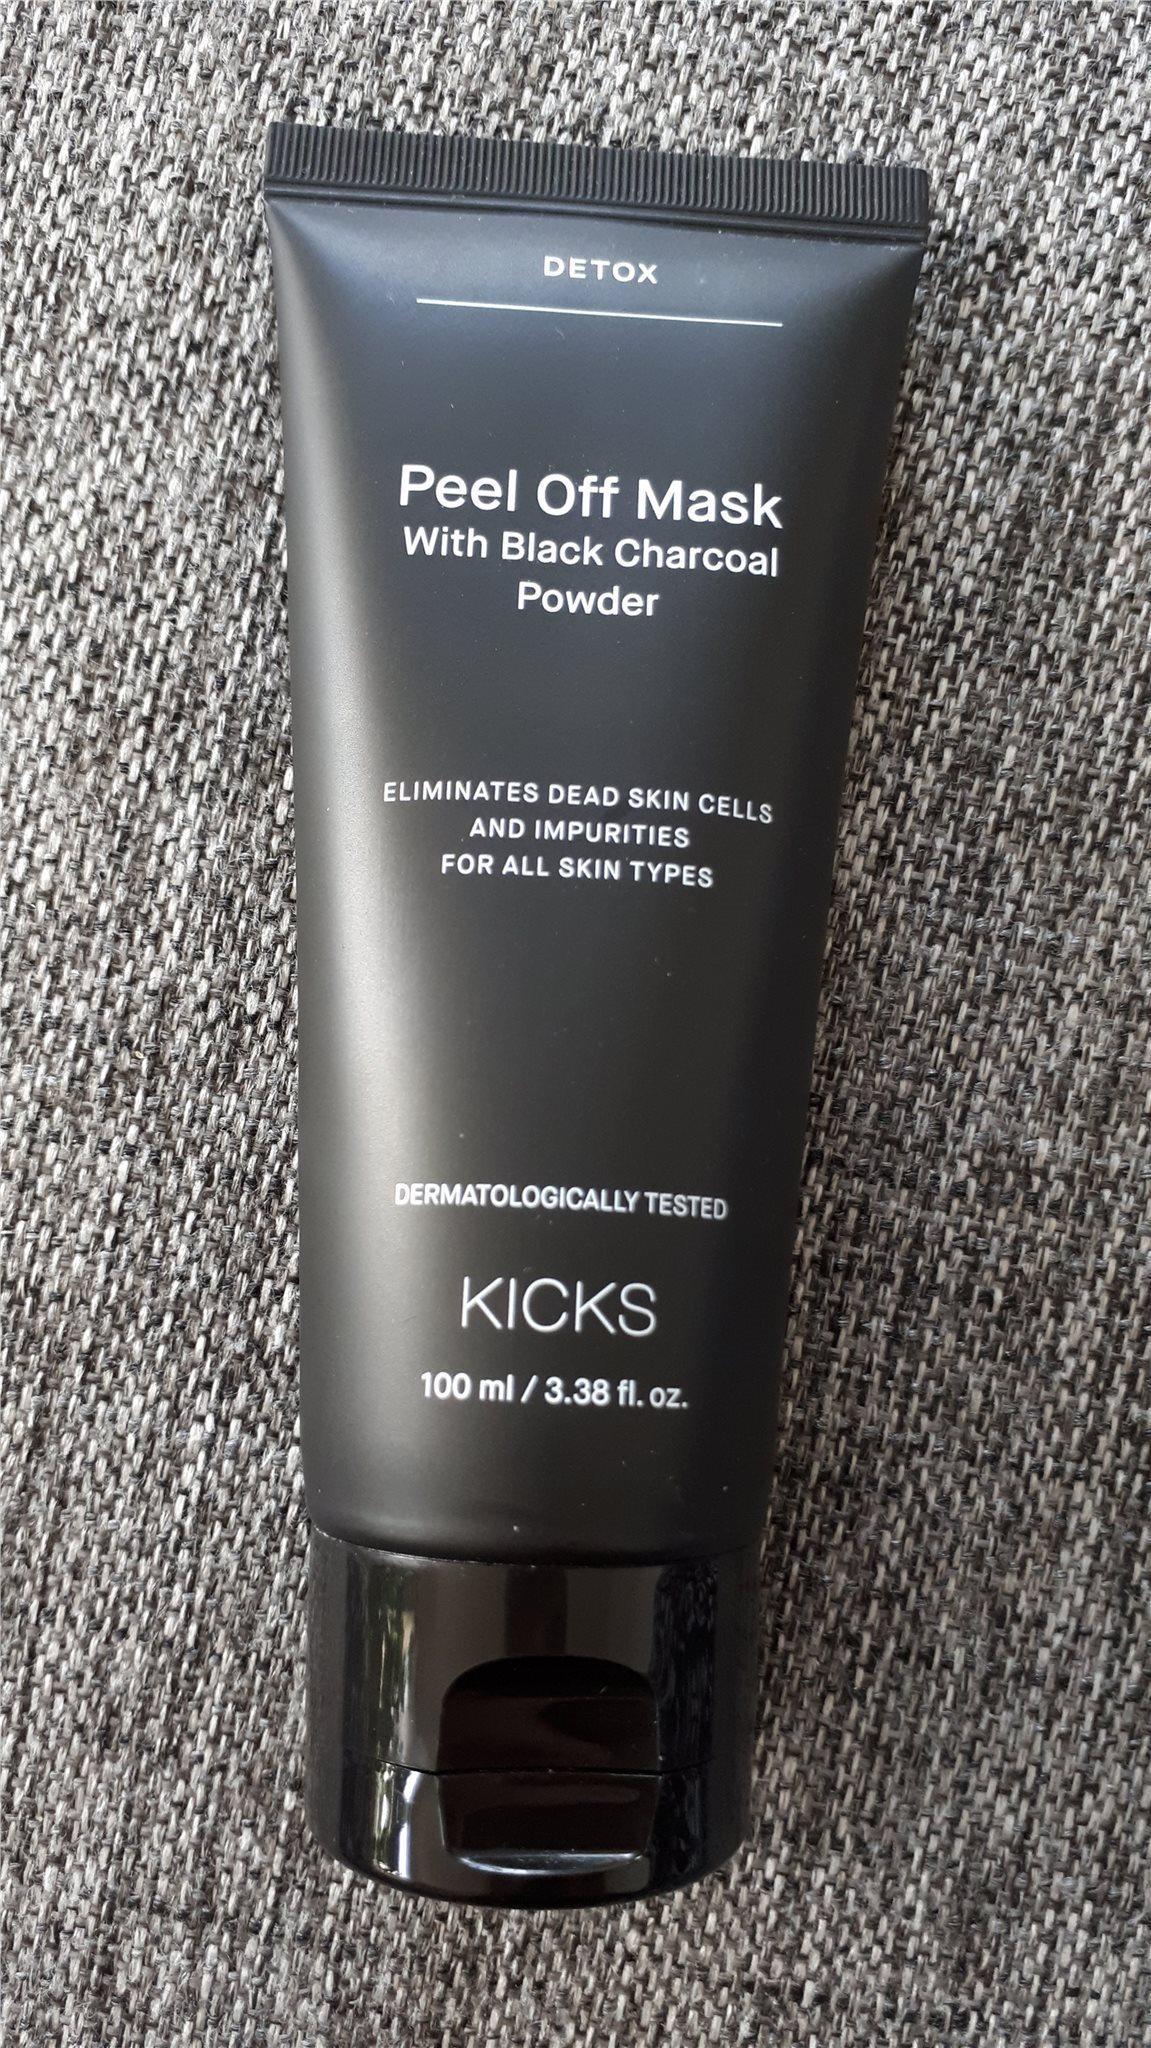 pormask mask kicks